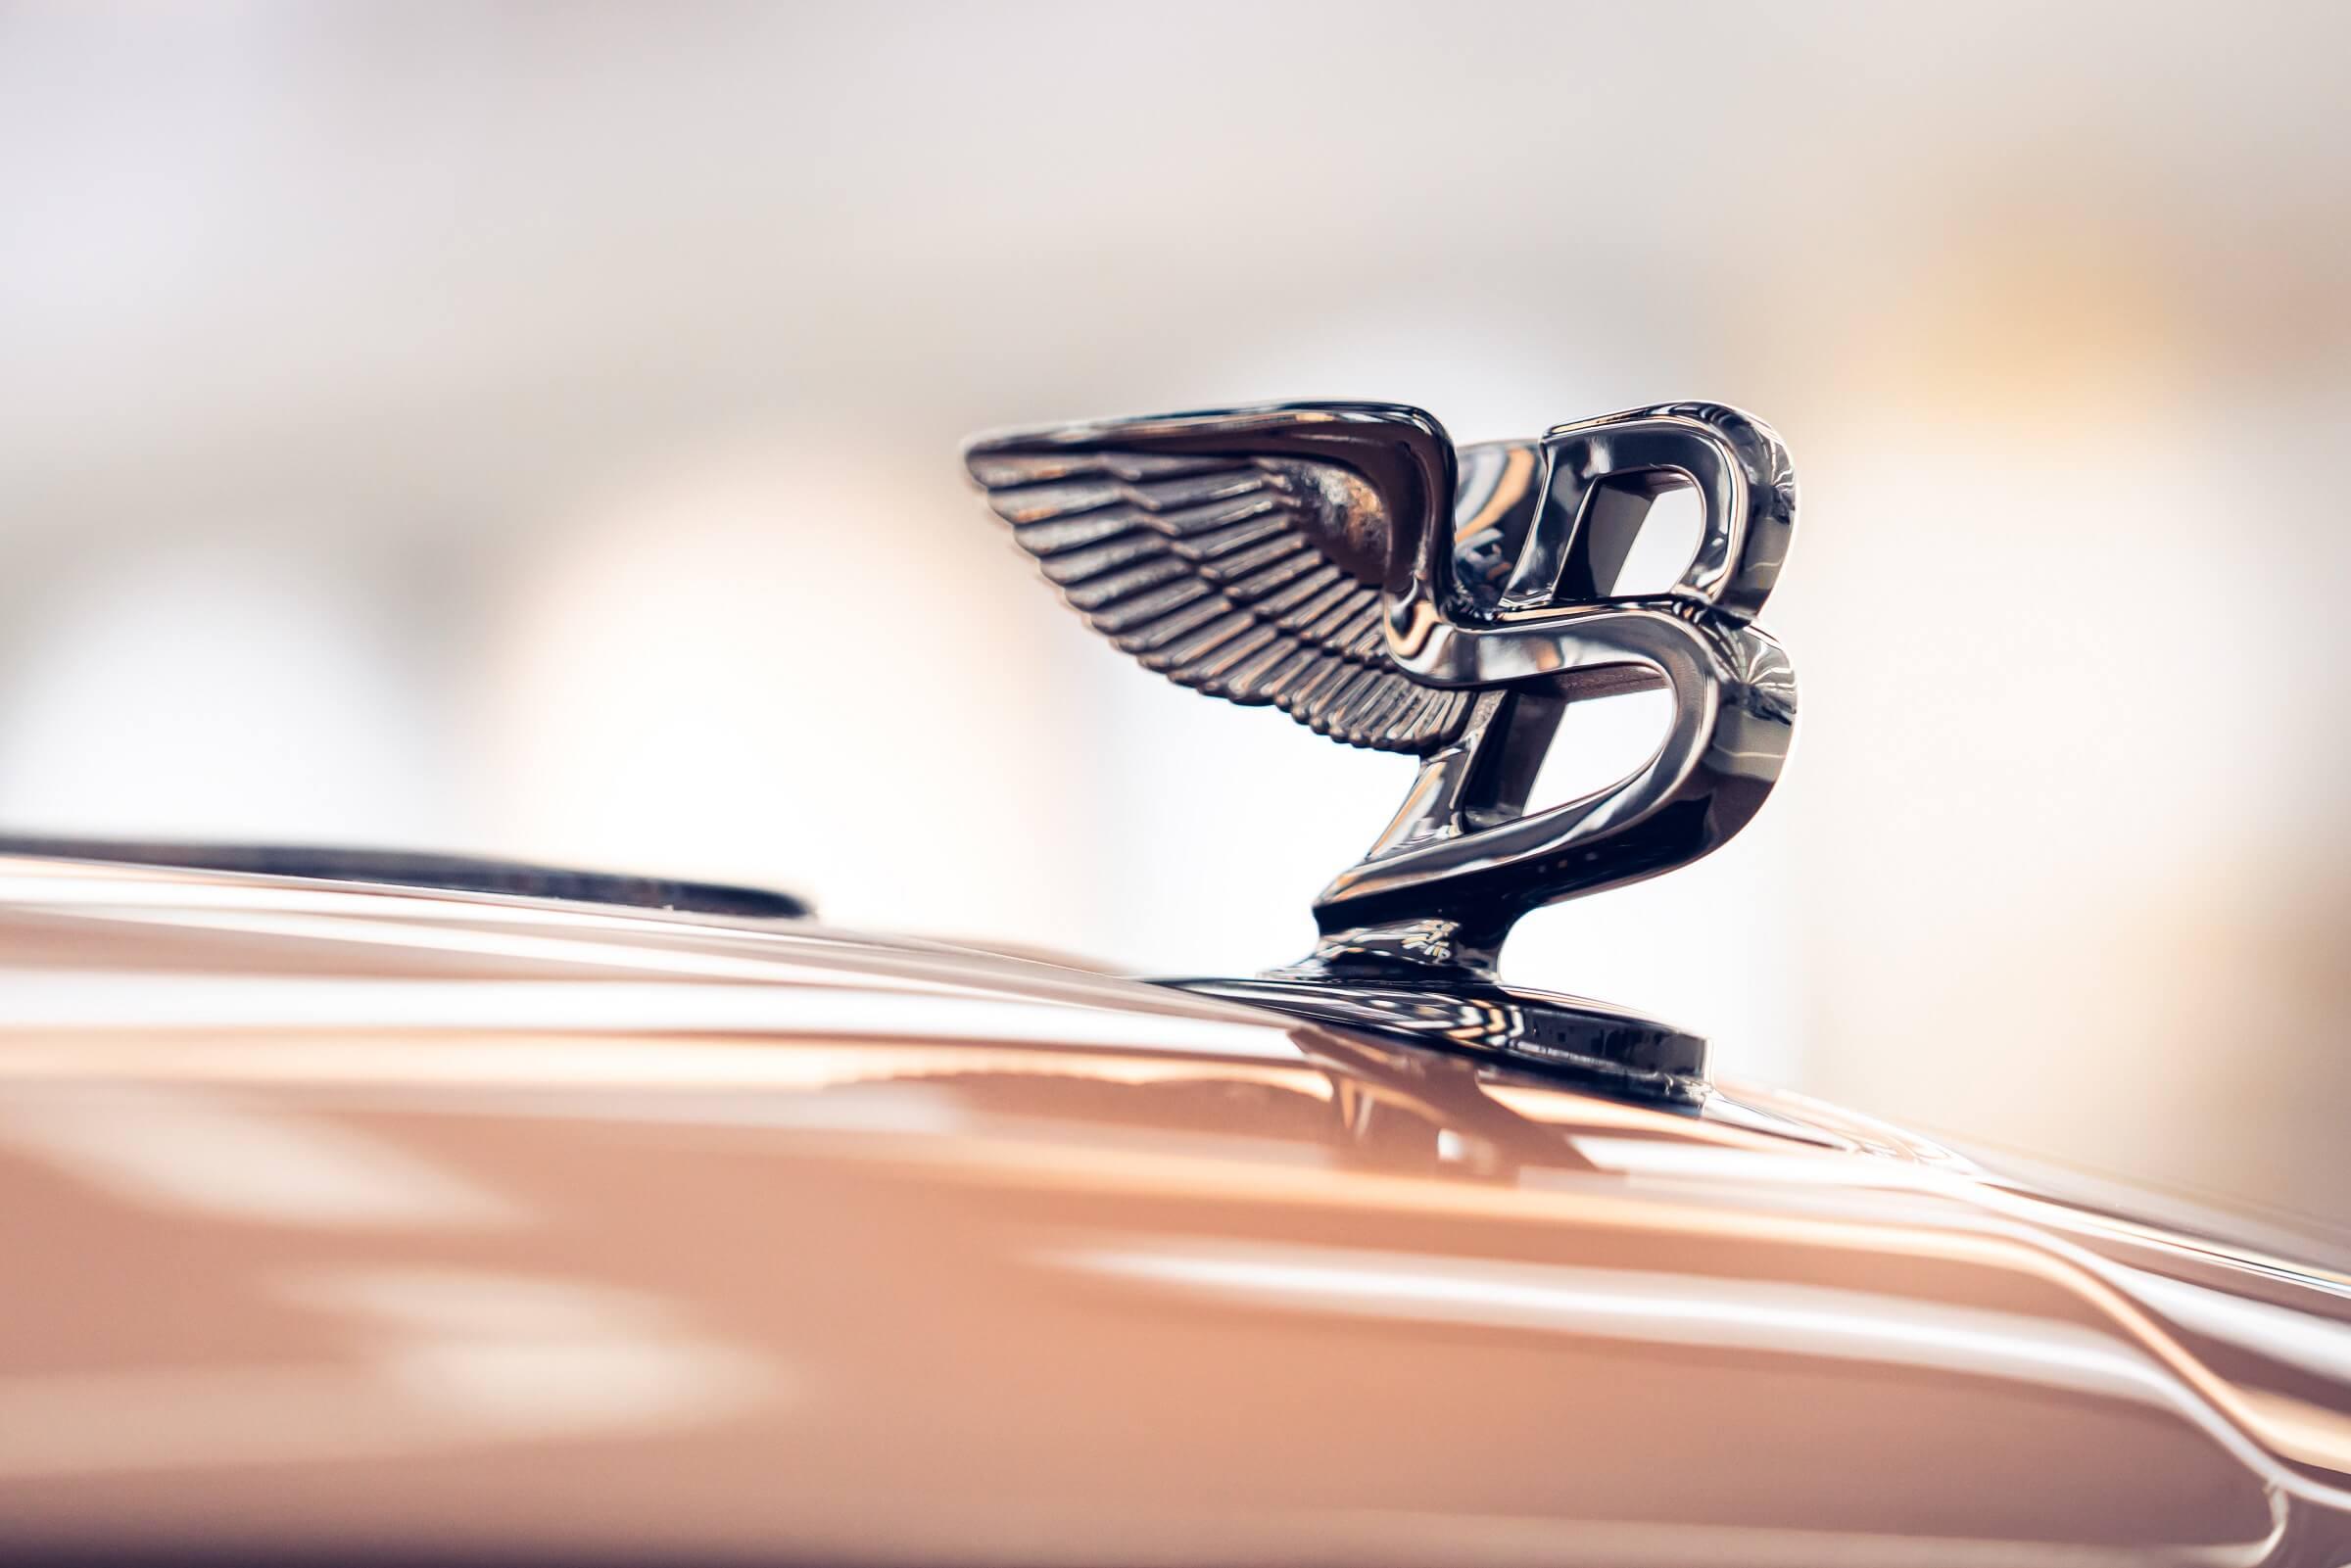 Bentley Mulsanne - Το τέλος μιας εποχής - Λεπτομέρεια από το σήμα στο καπό